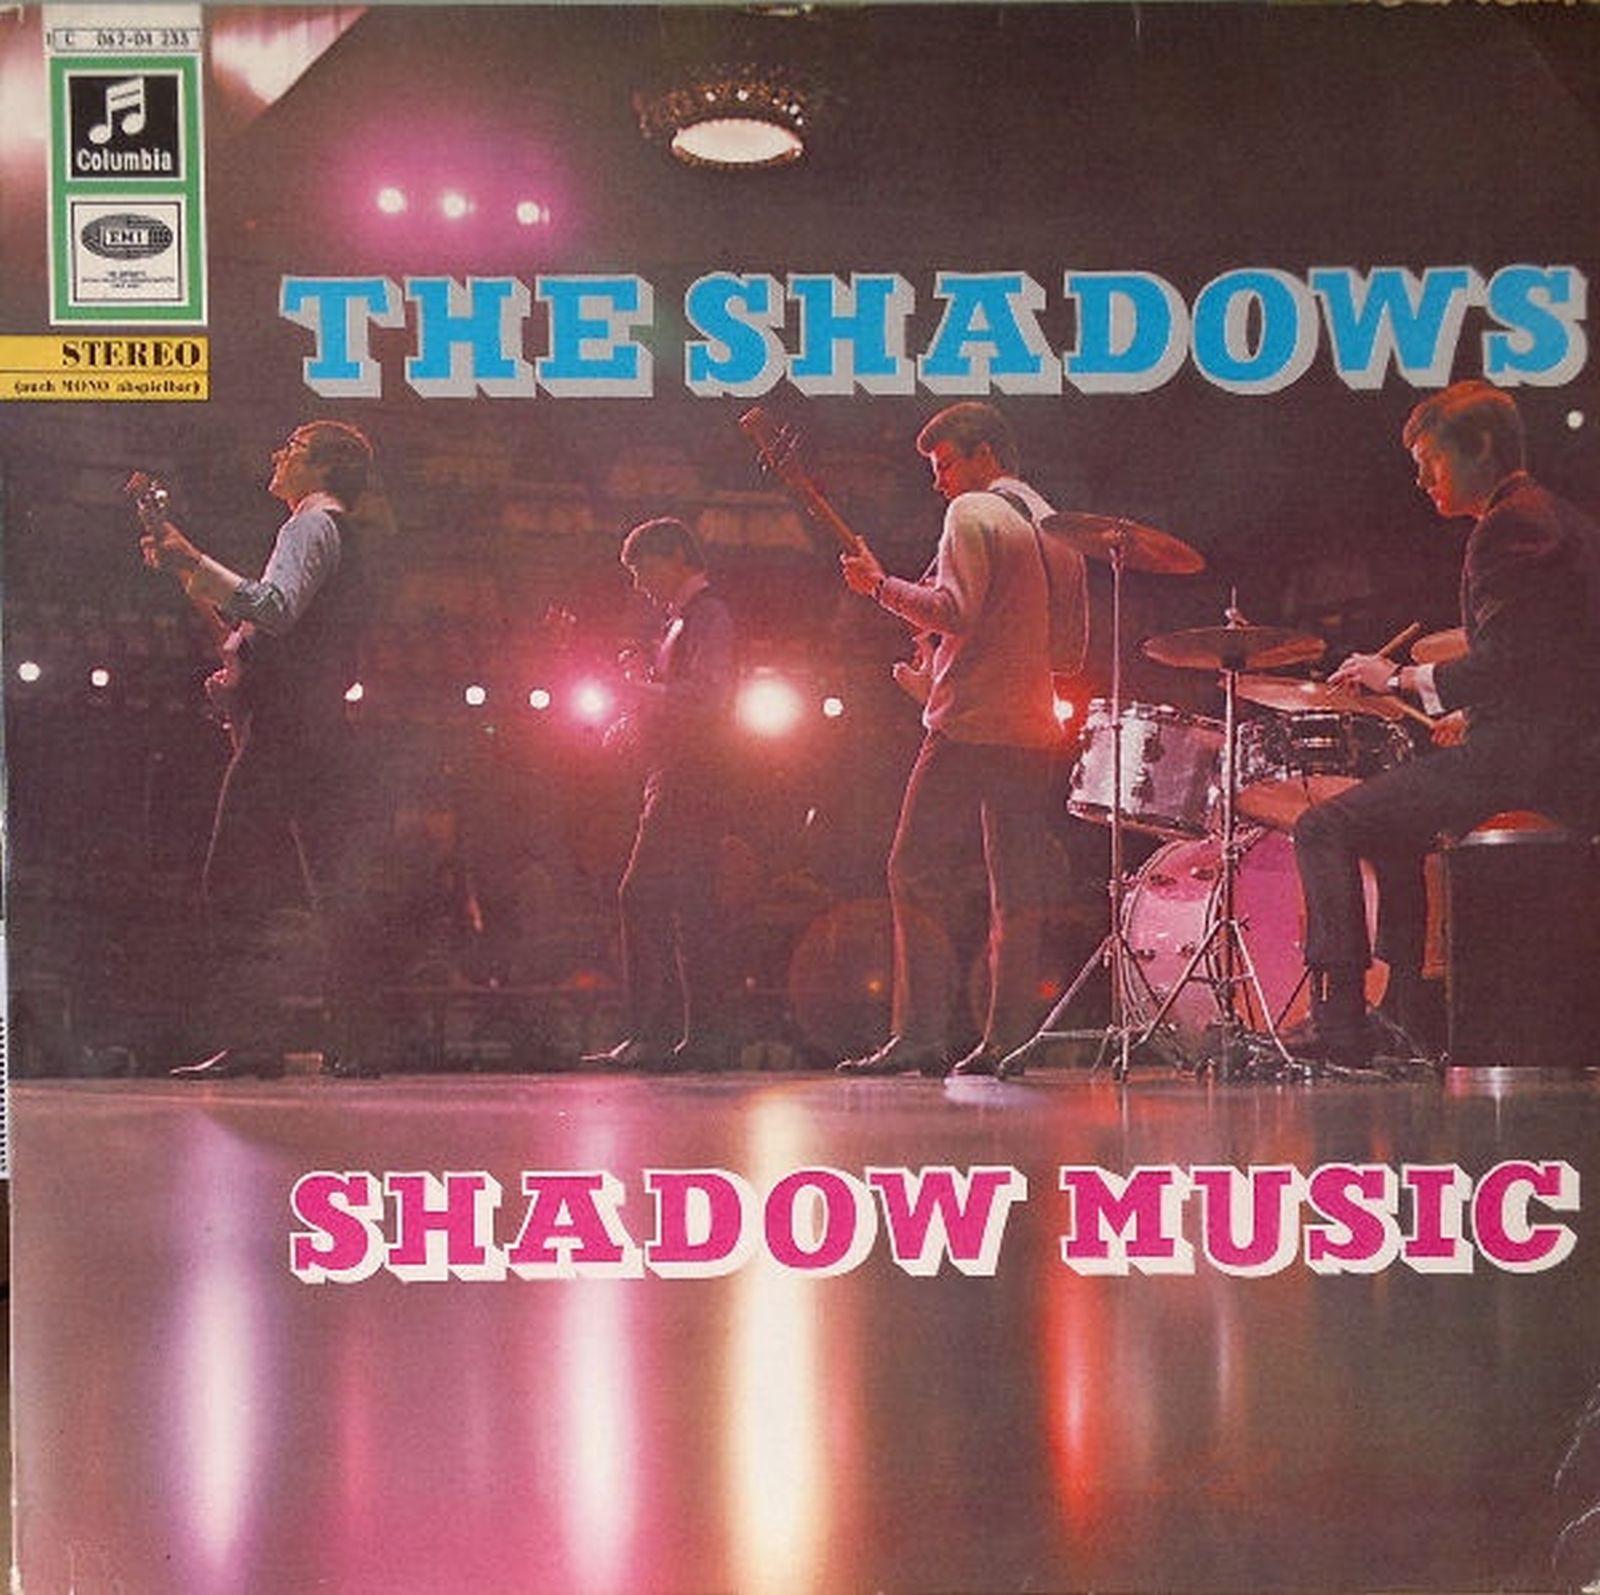 The Shadows Shadow Music Lp Album Columbia 1c062 04233